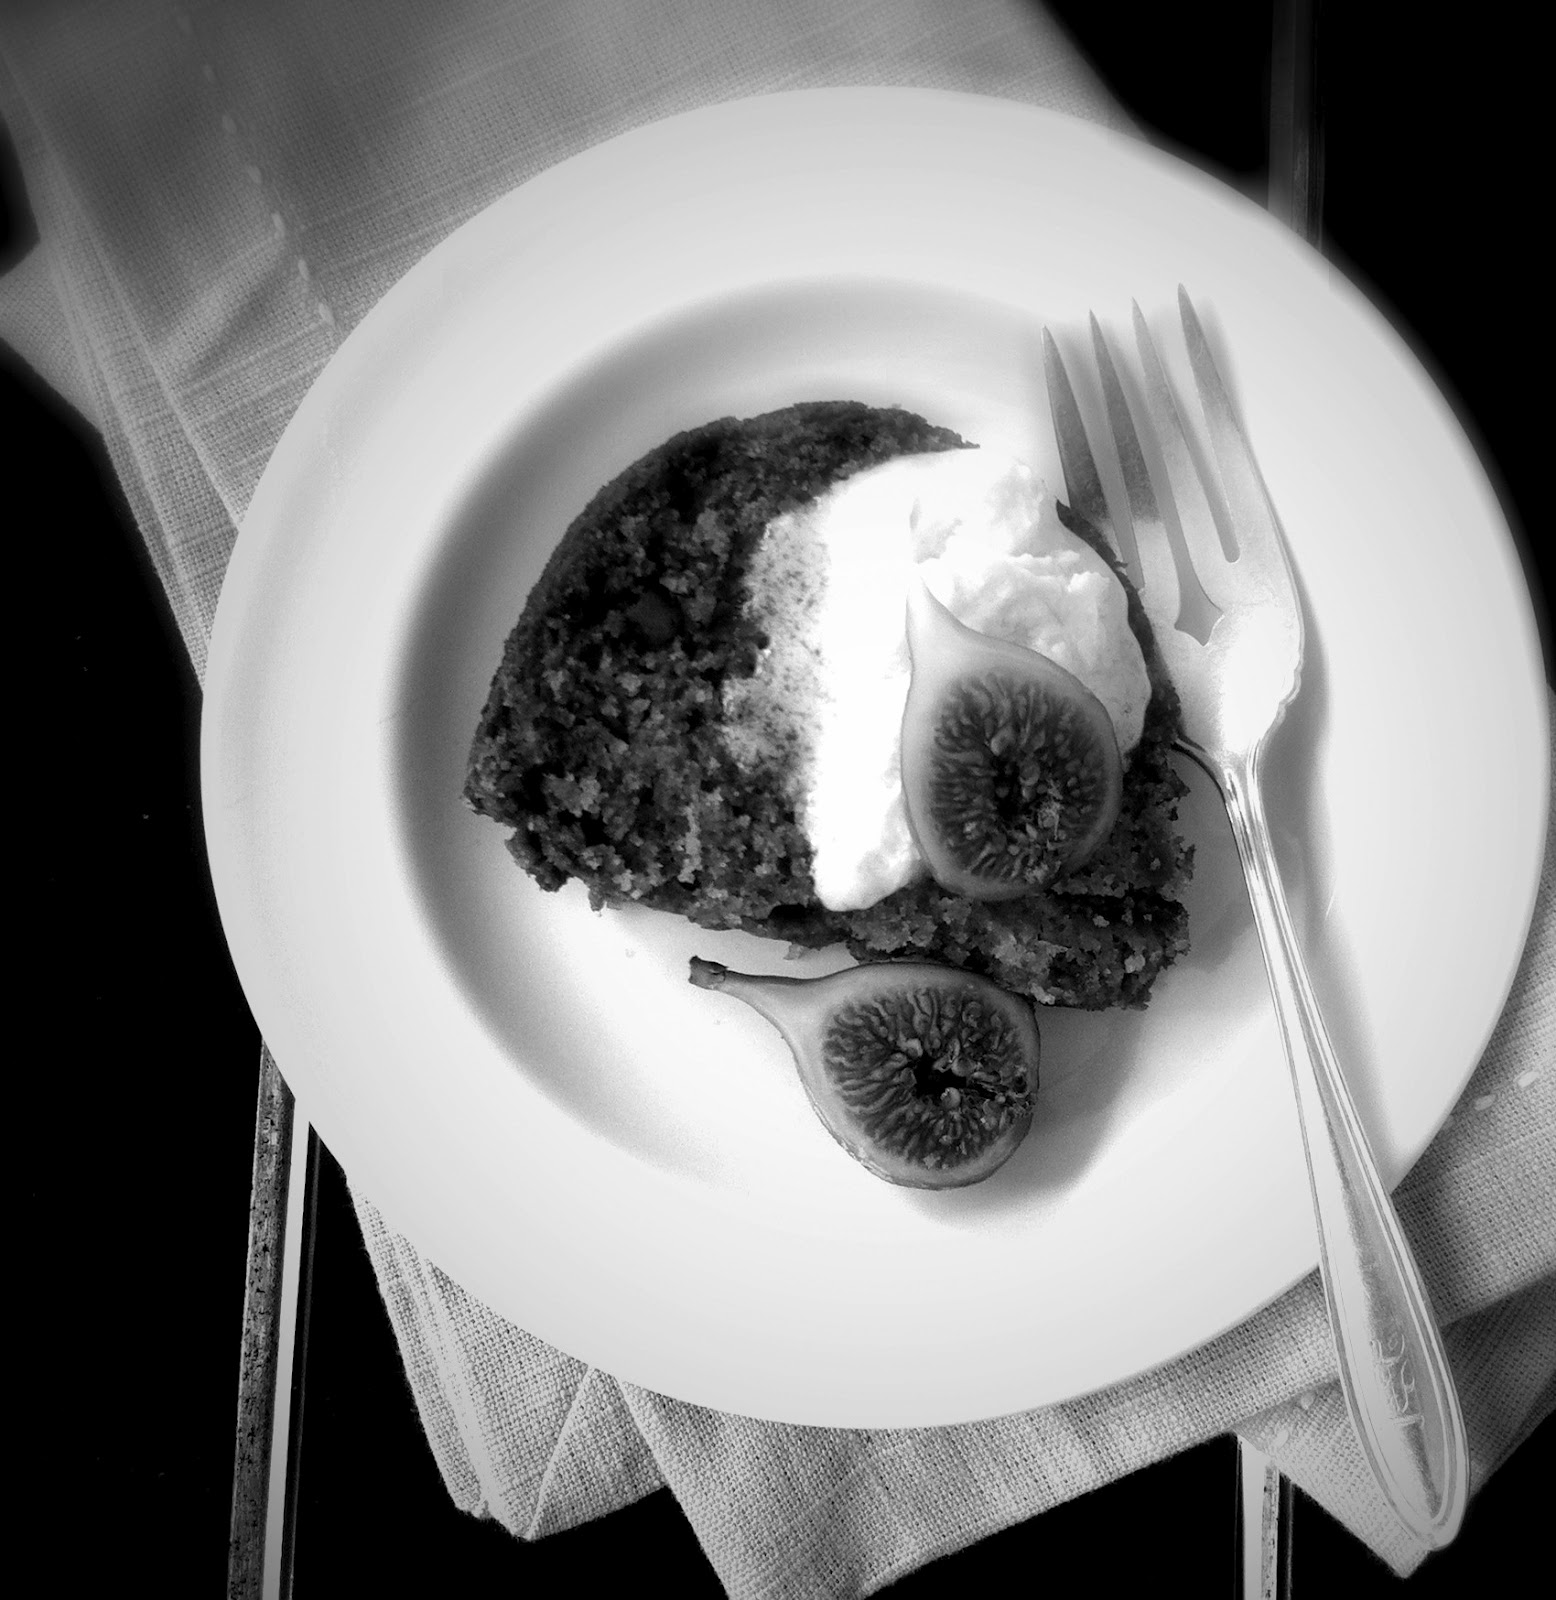 Easy Fig Preserve Cake Recipe